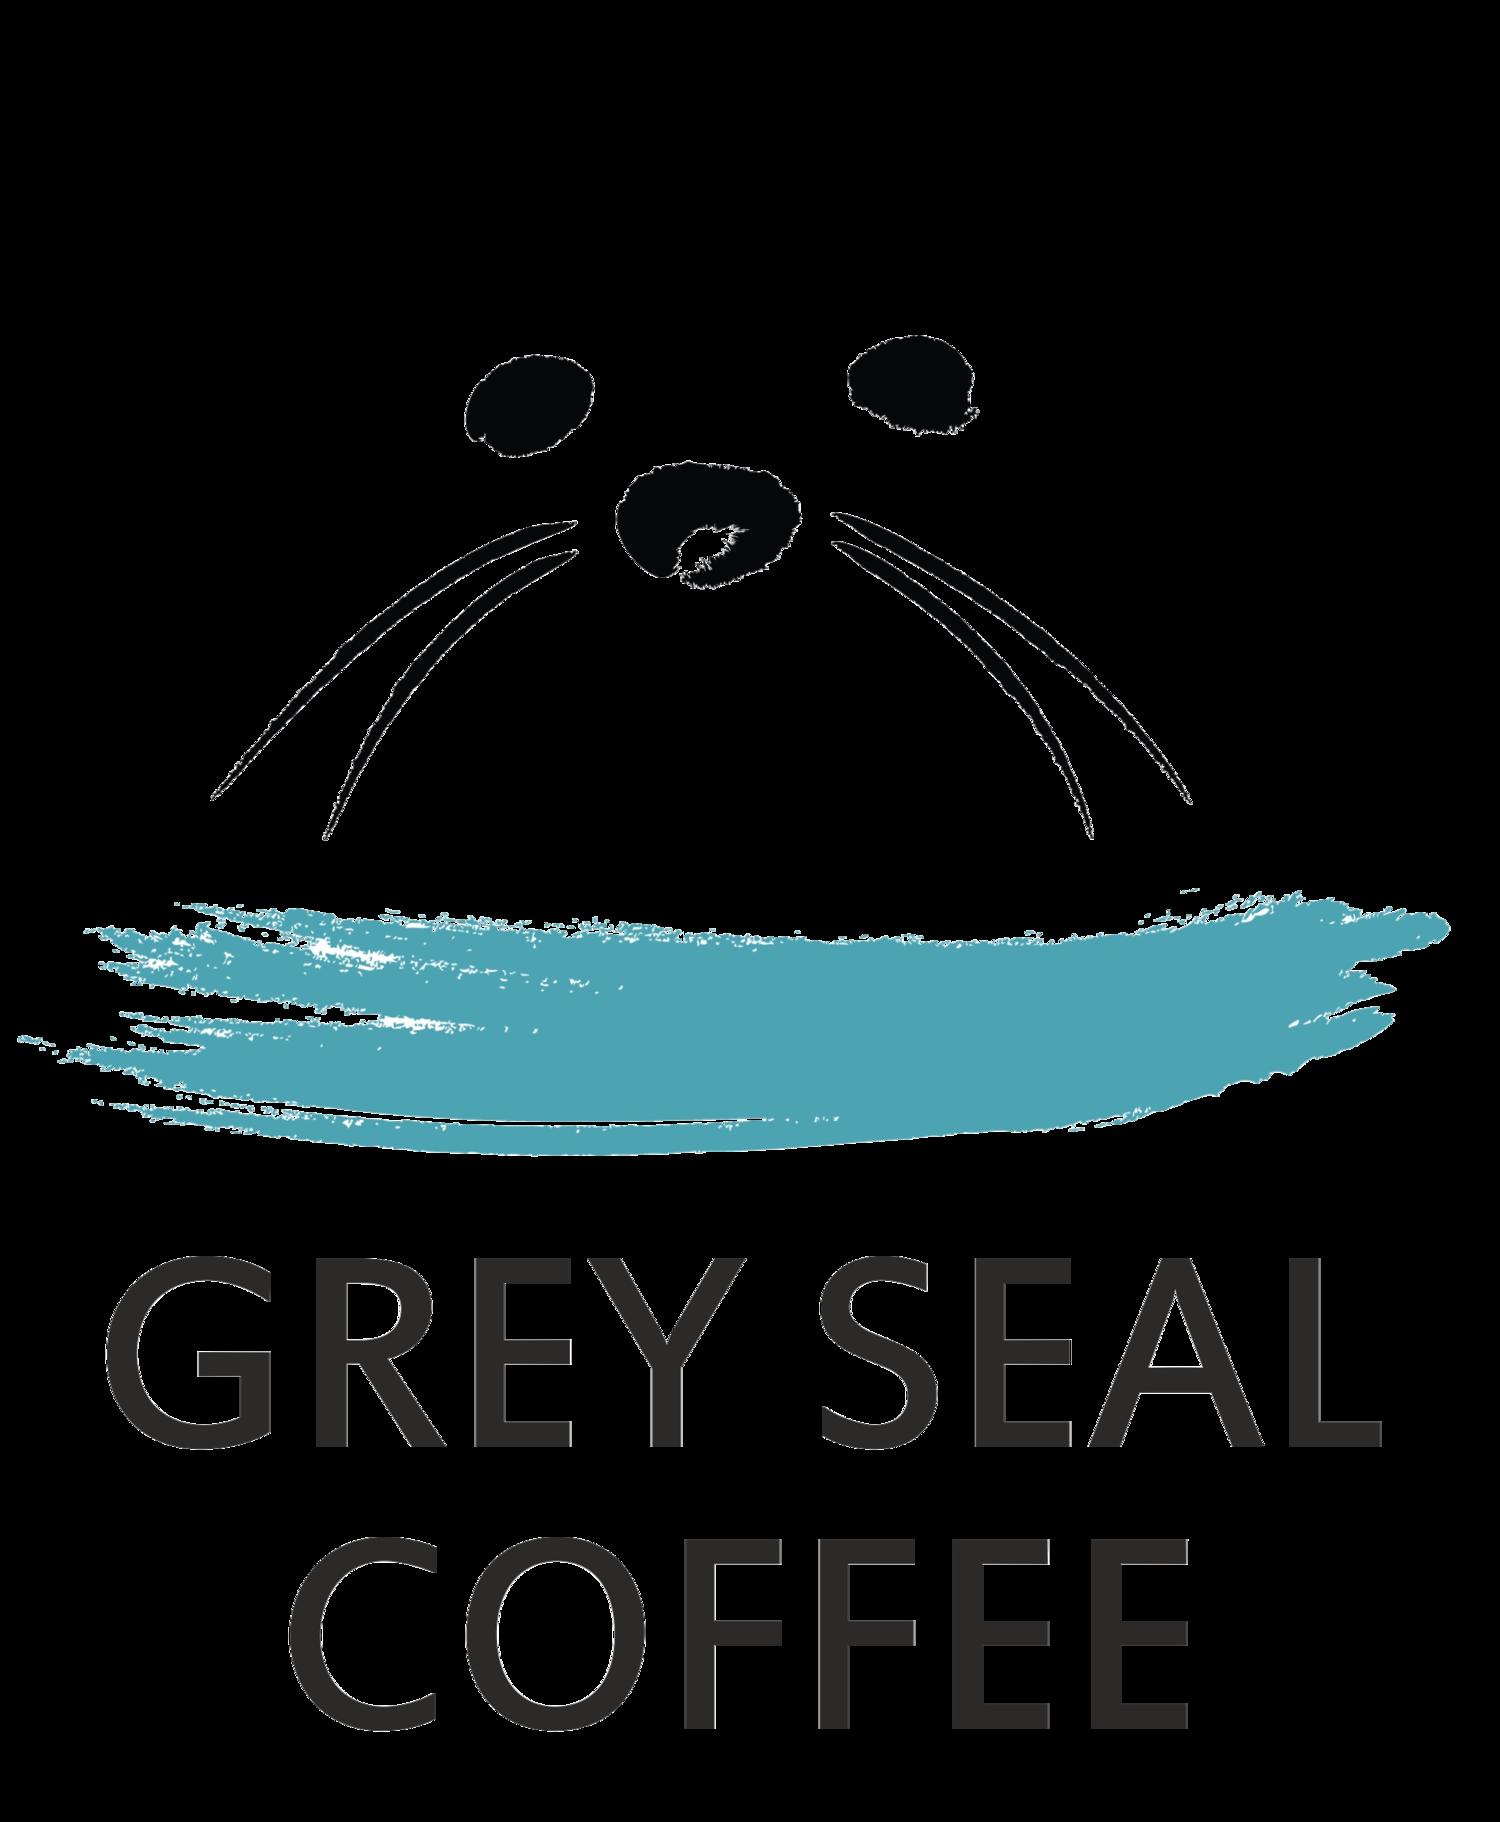 Gsc Grey Seal Coffee